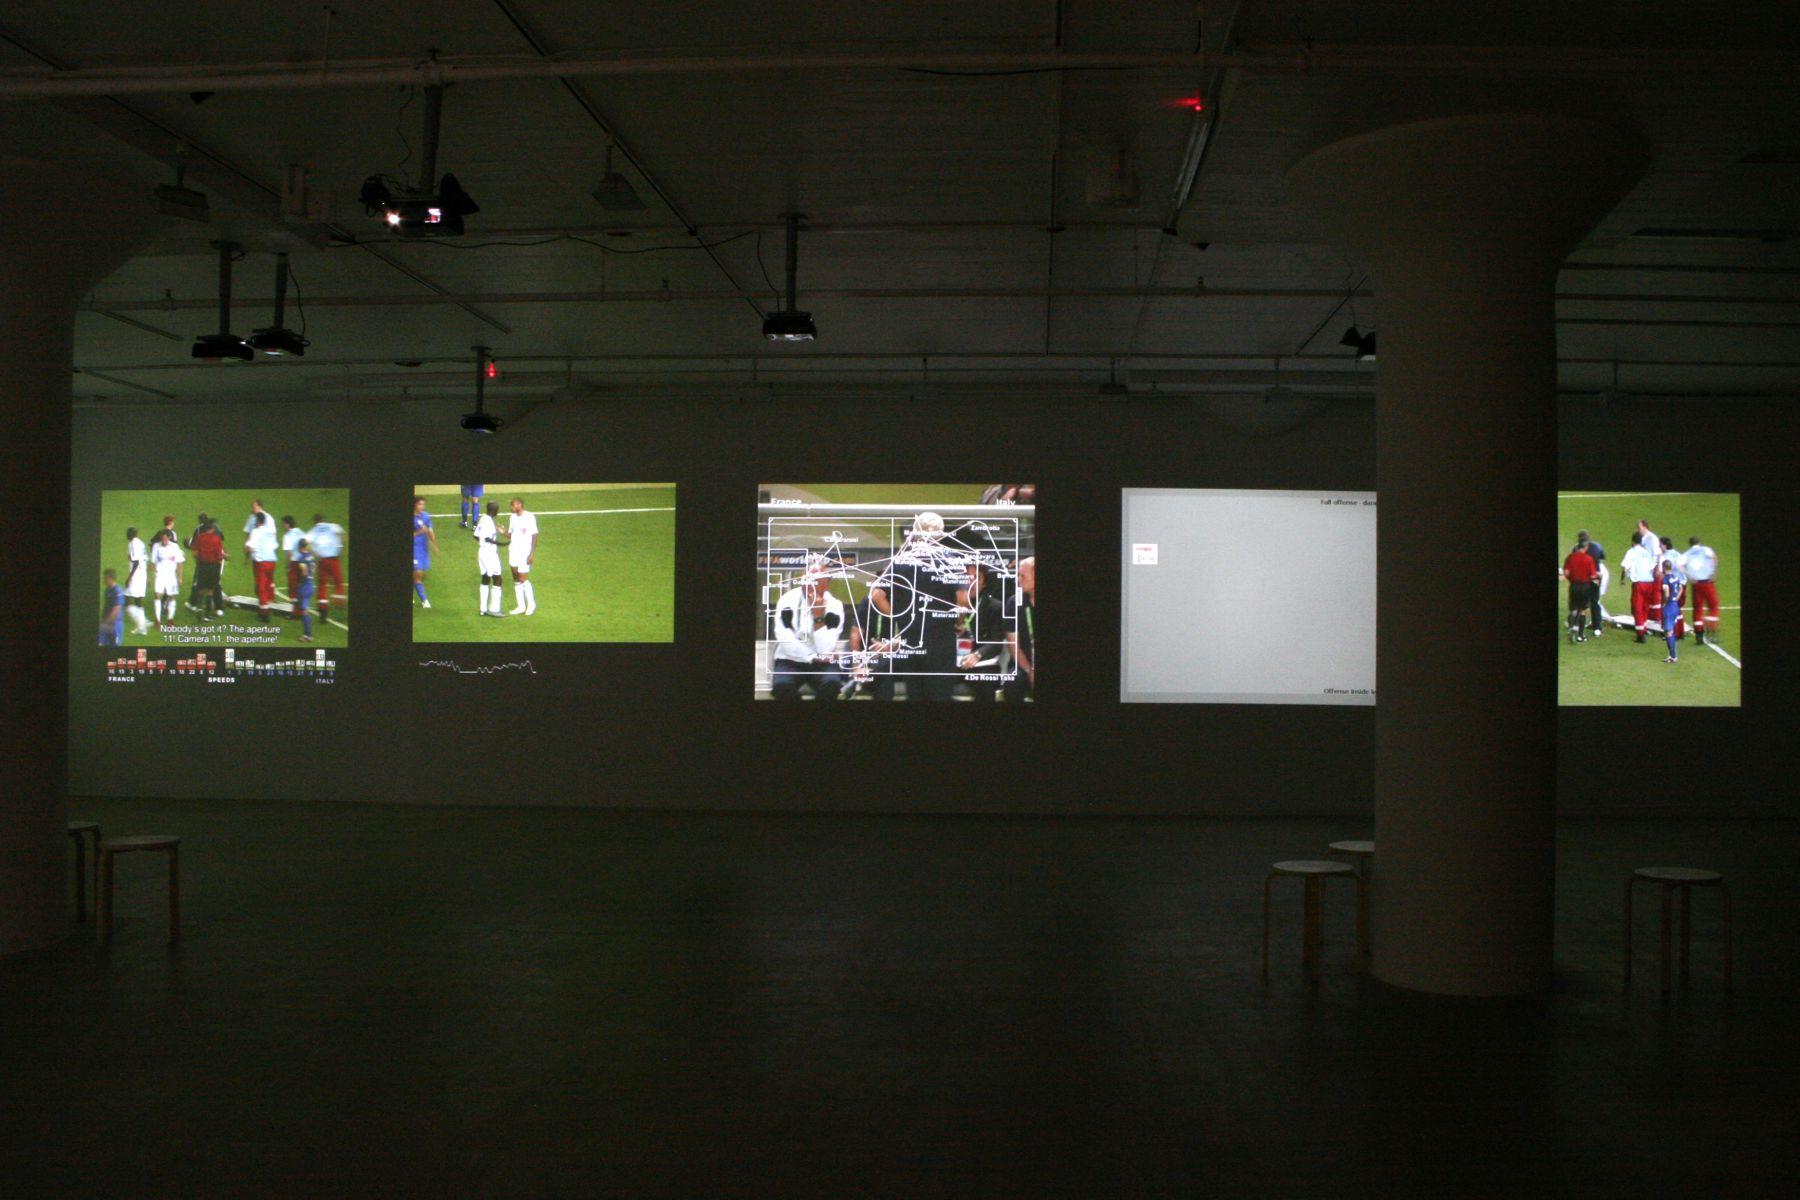 Installation view, Deep Play, Greene Naftali, New York, 2008